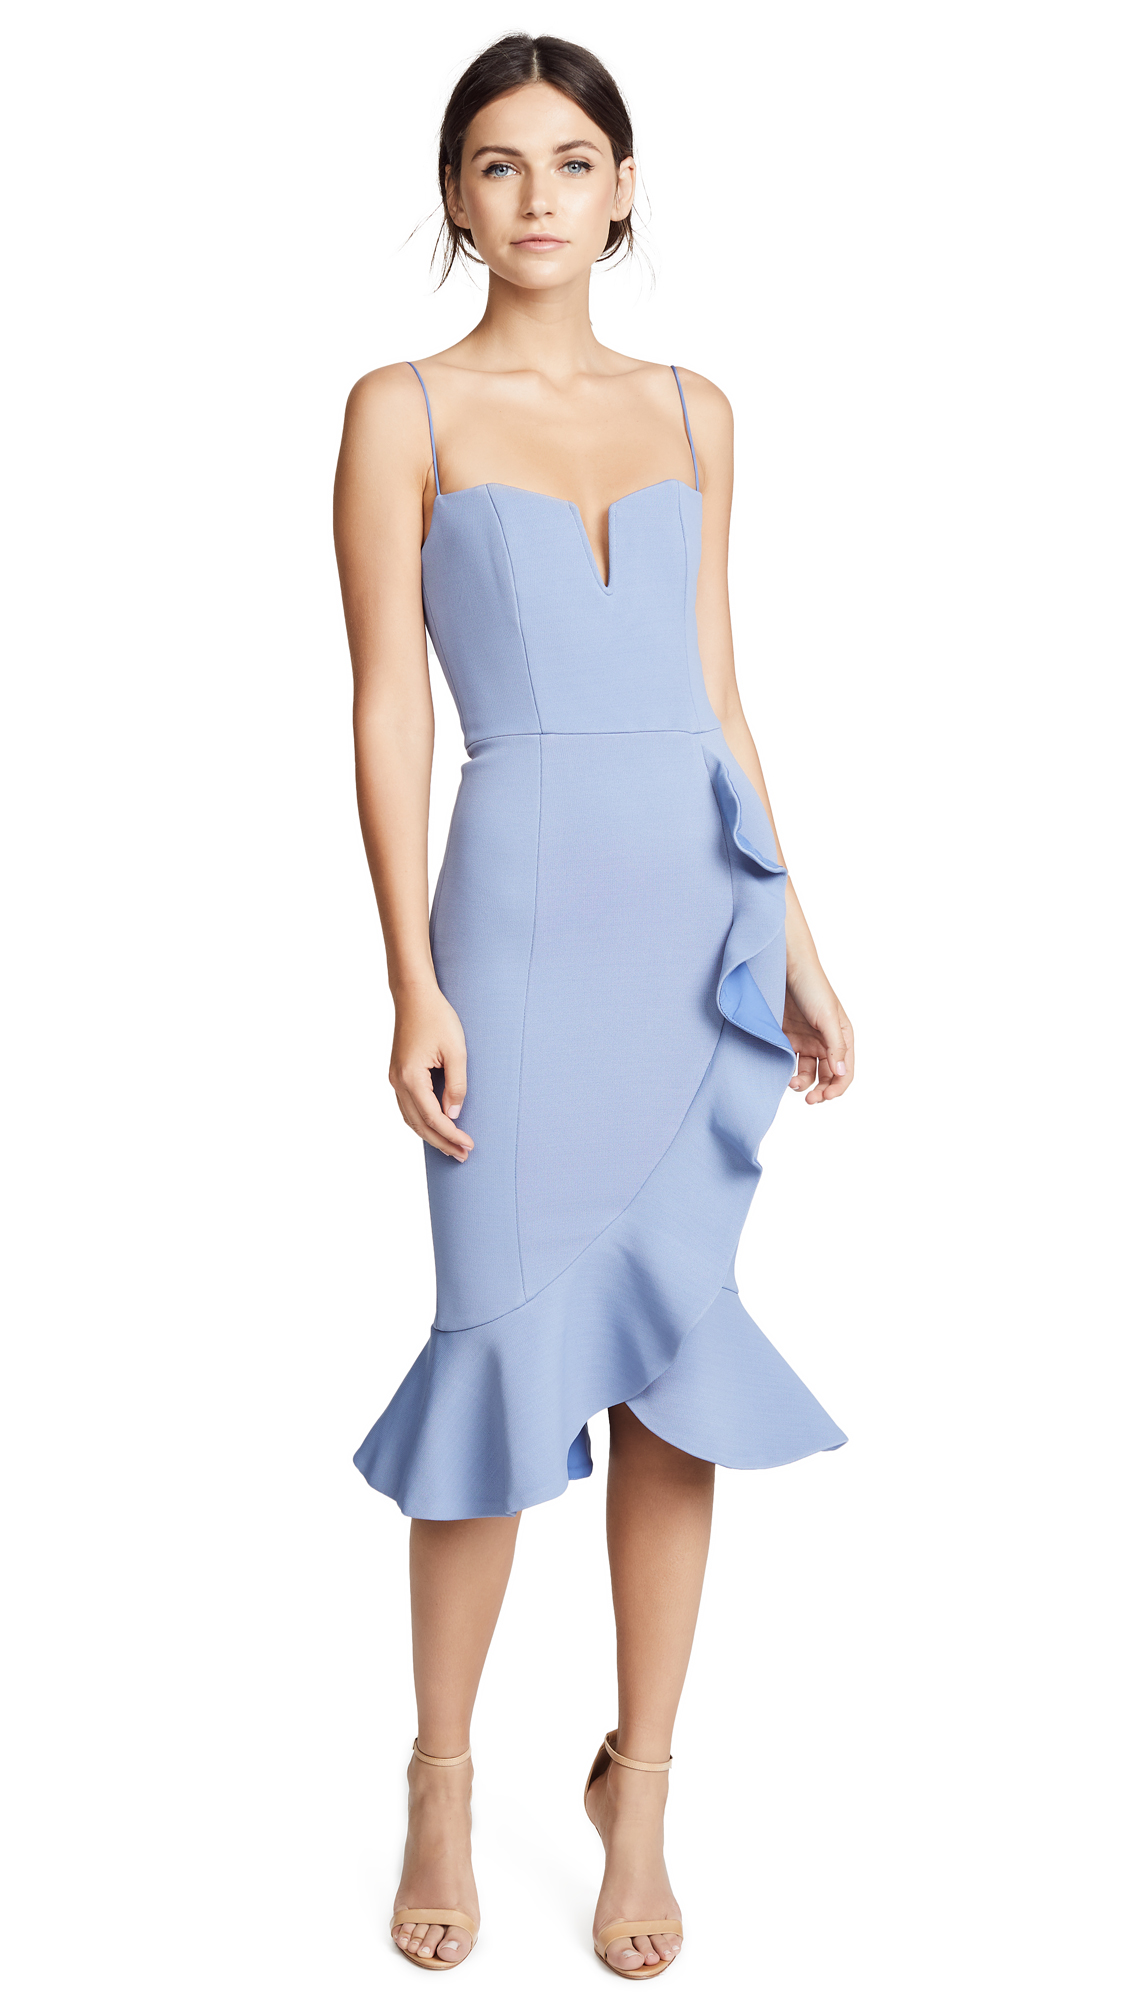 Nicholas Bandage Frill Wrap Dress In Dusty Blue